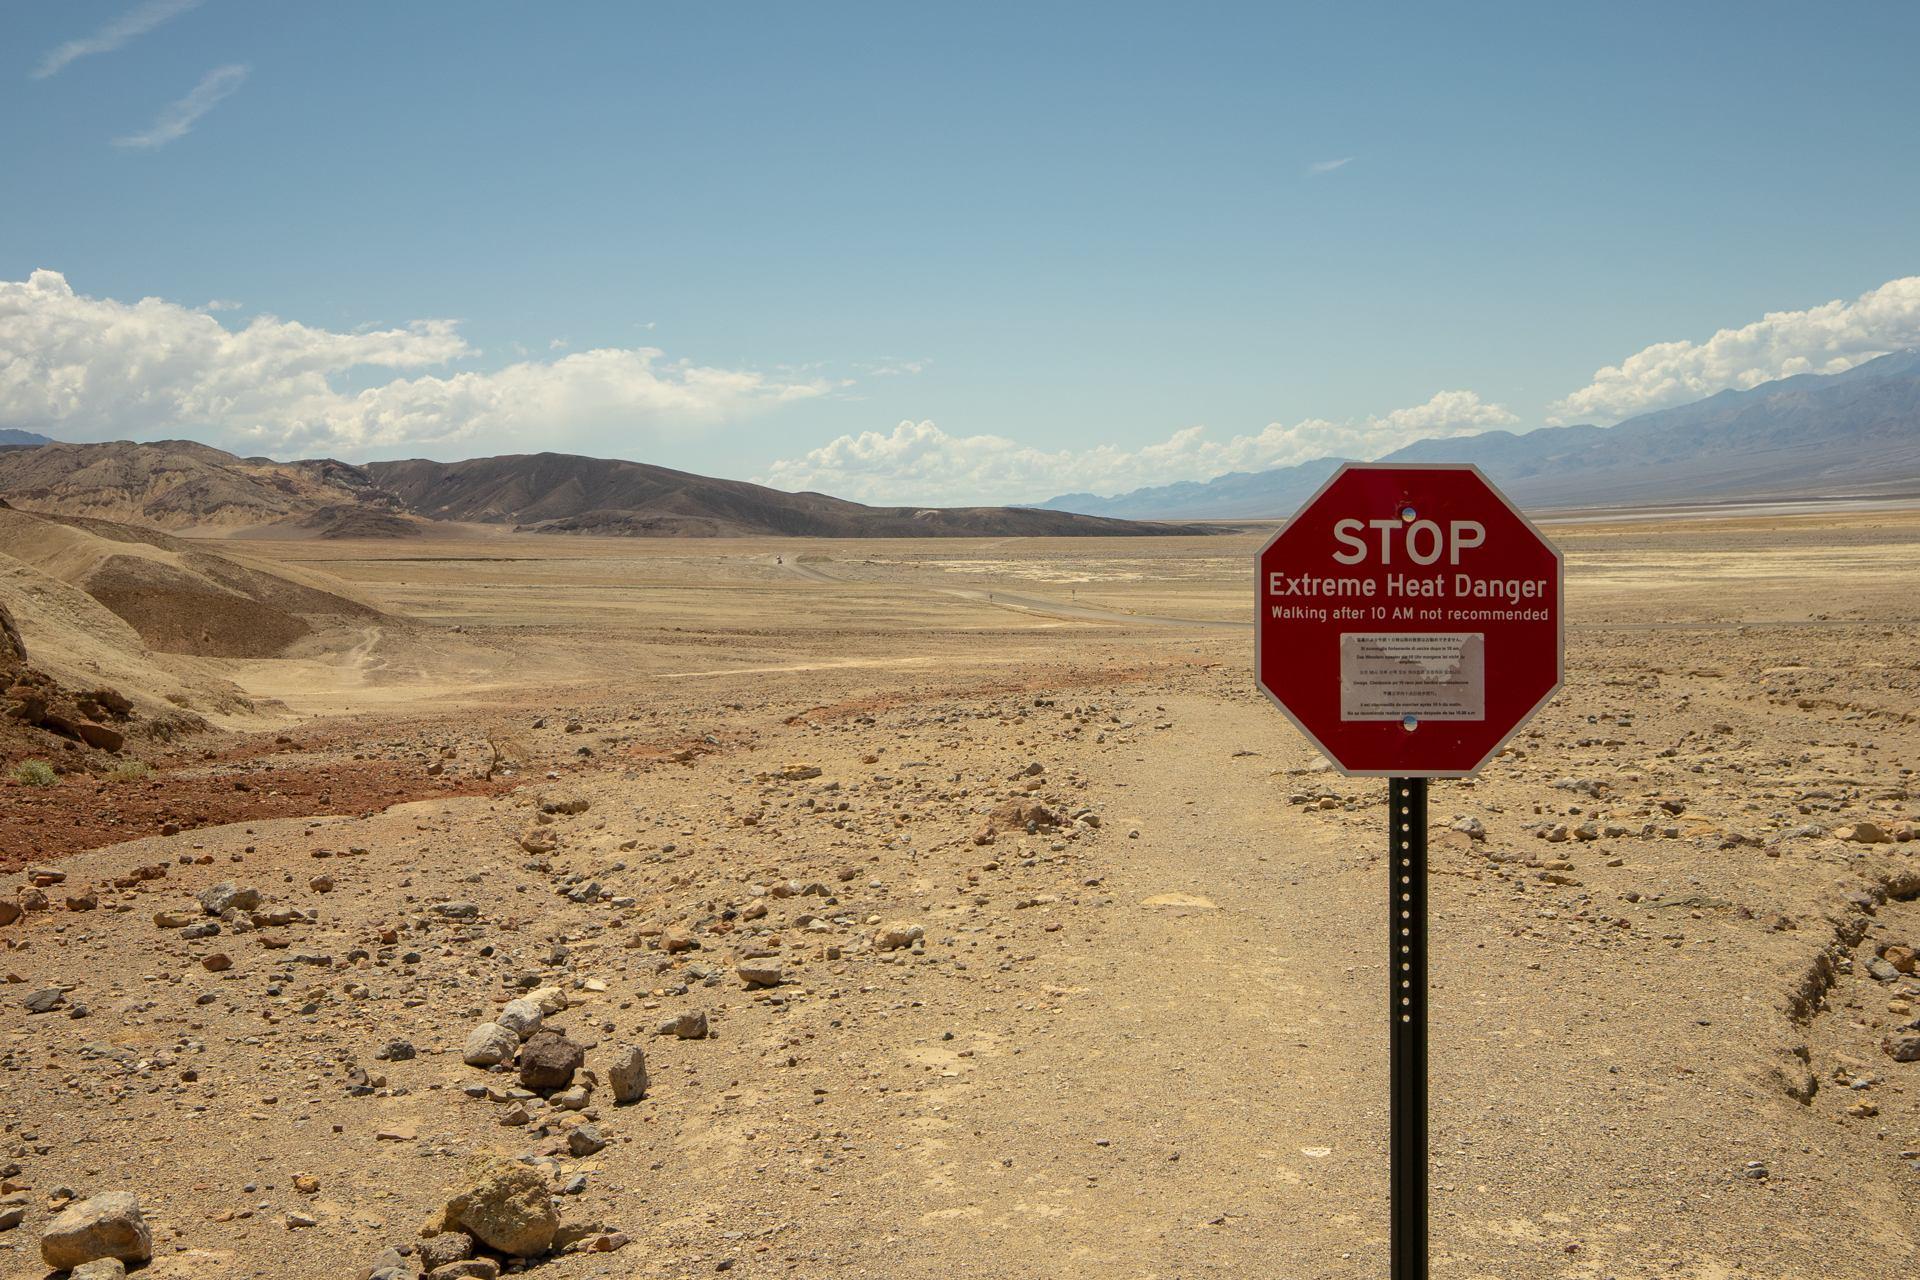 Extreme heat danger